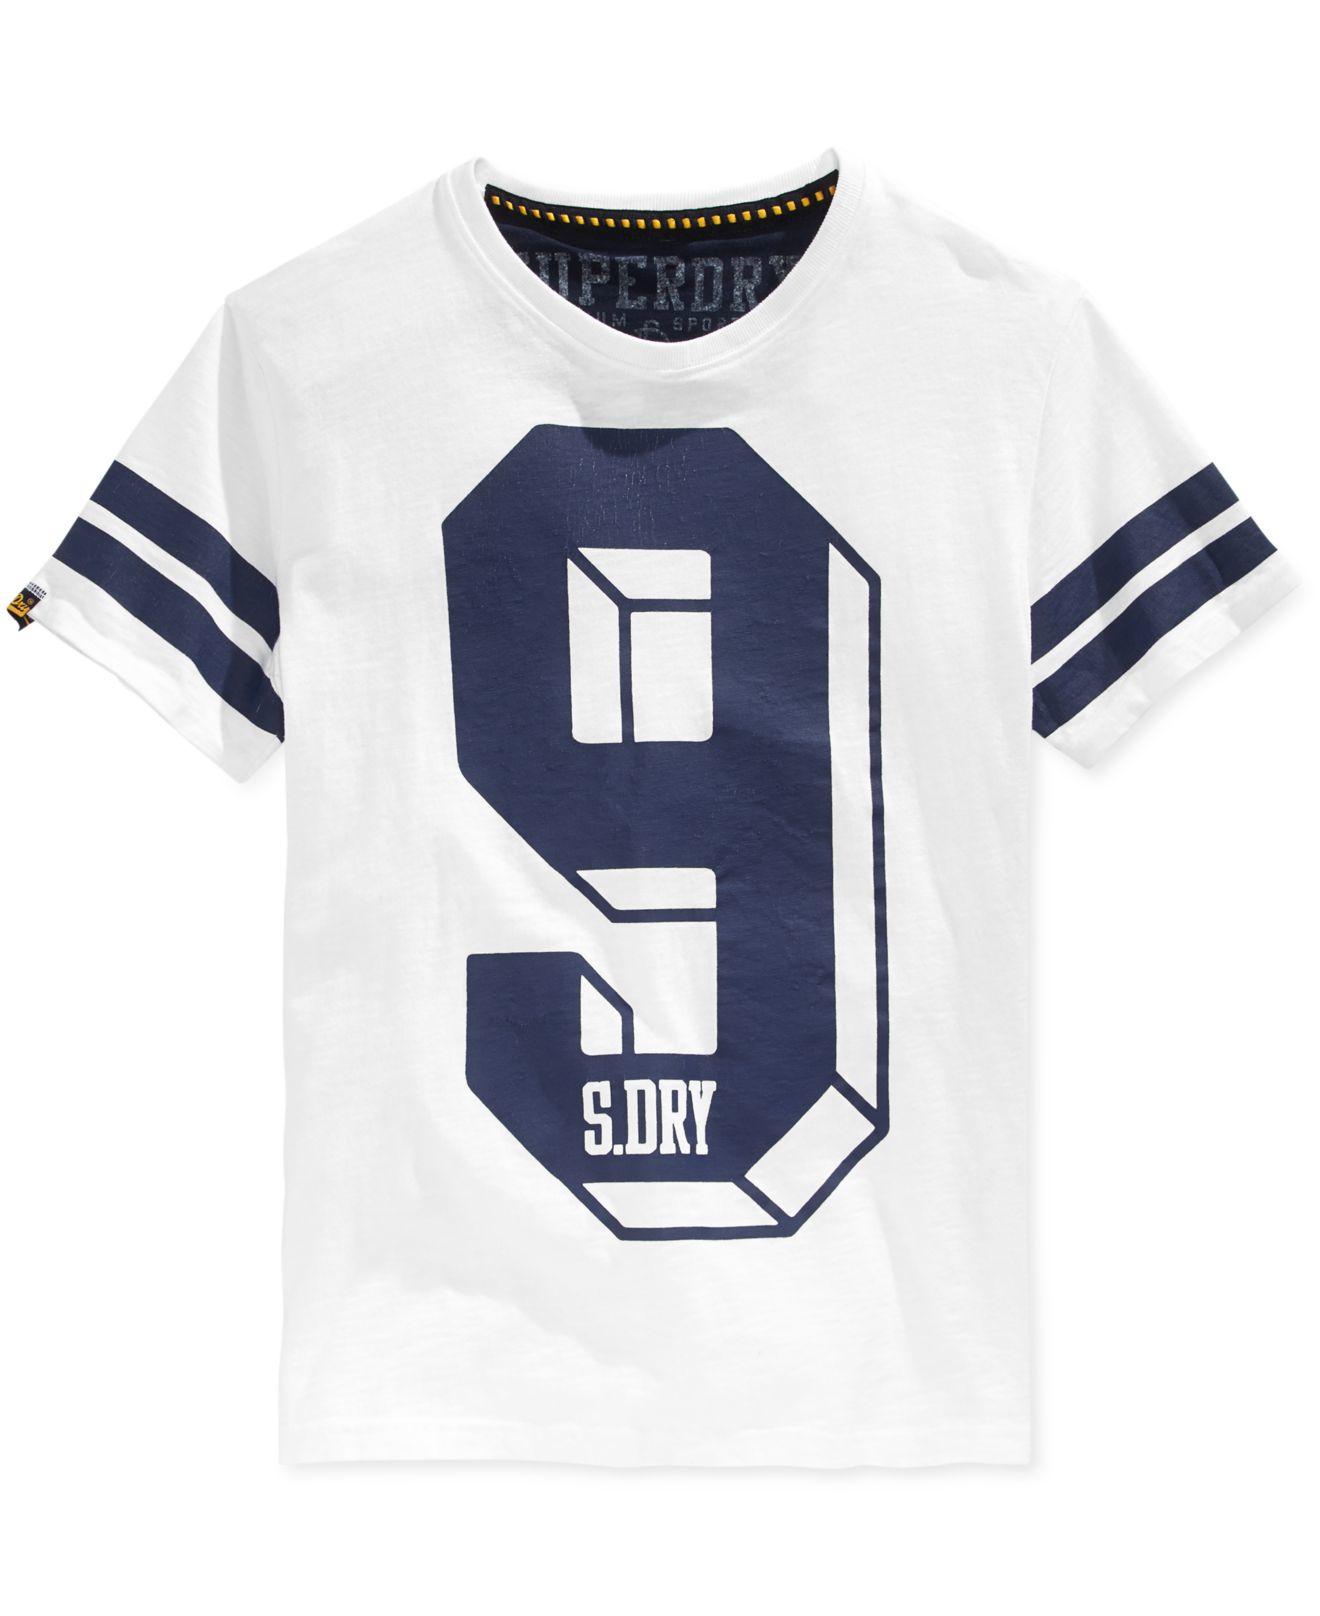 e15eb854e860 Mens T Shirts Macys